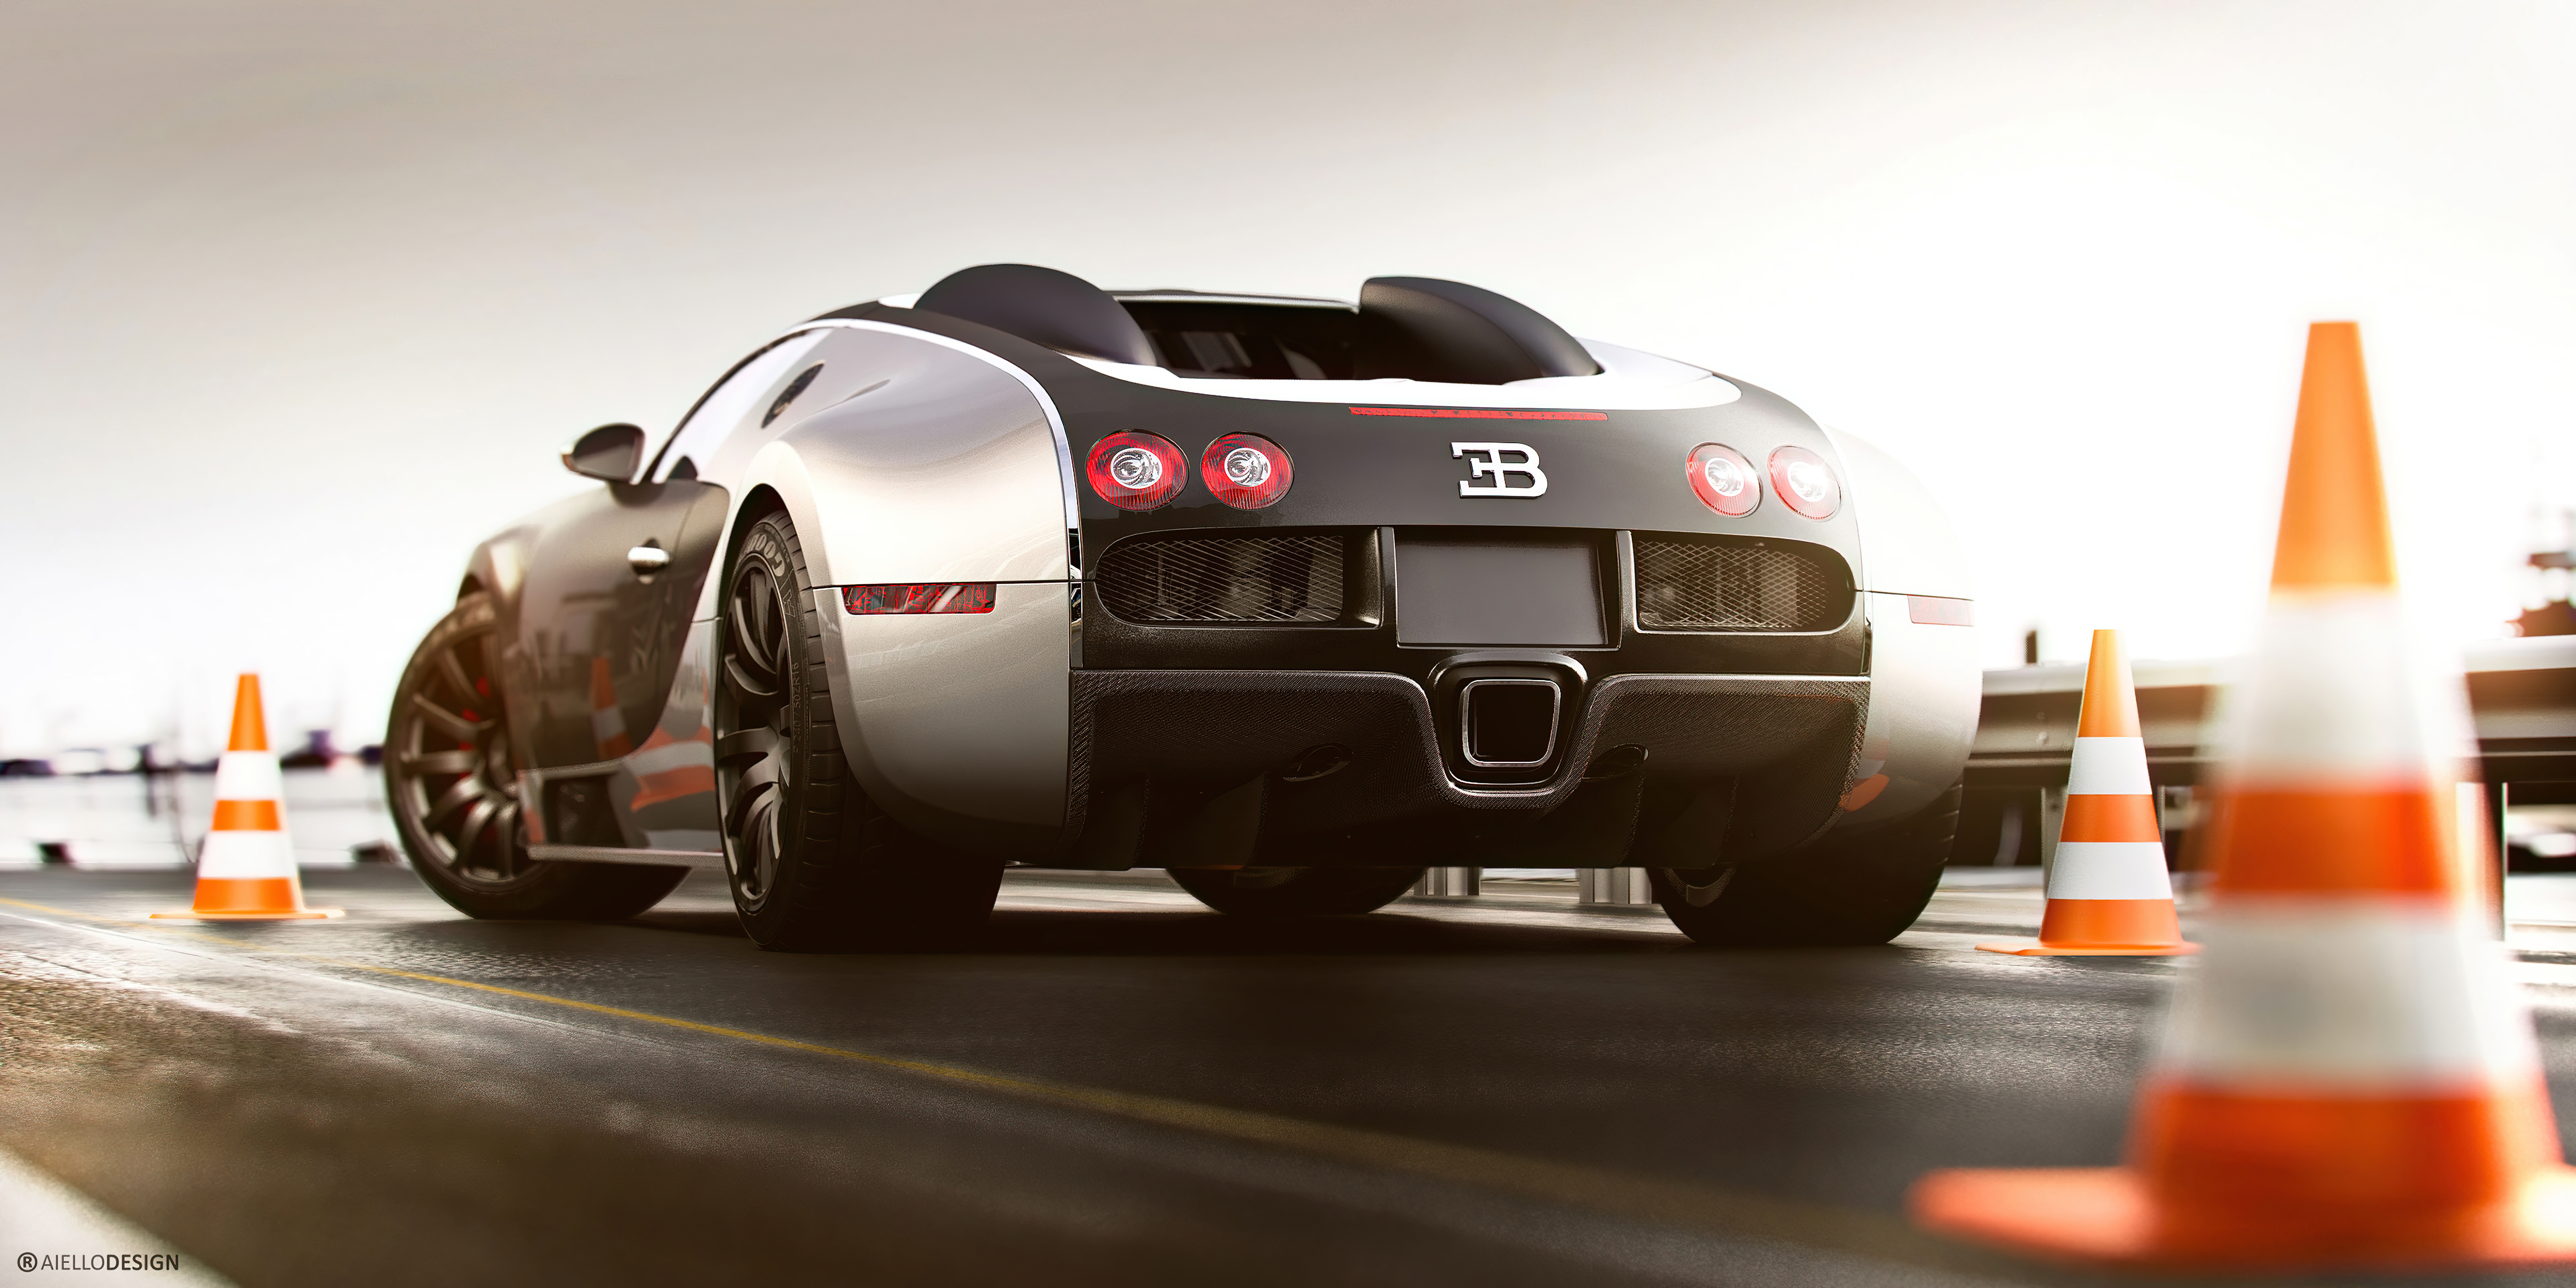 bugatti cgi 4k 1620171871 - Bugatti Cgi 4k - Bugatti Cgi 4k wallpapers